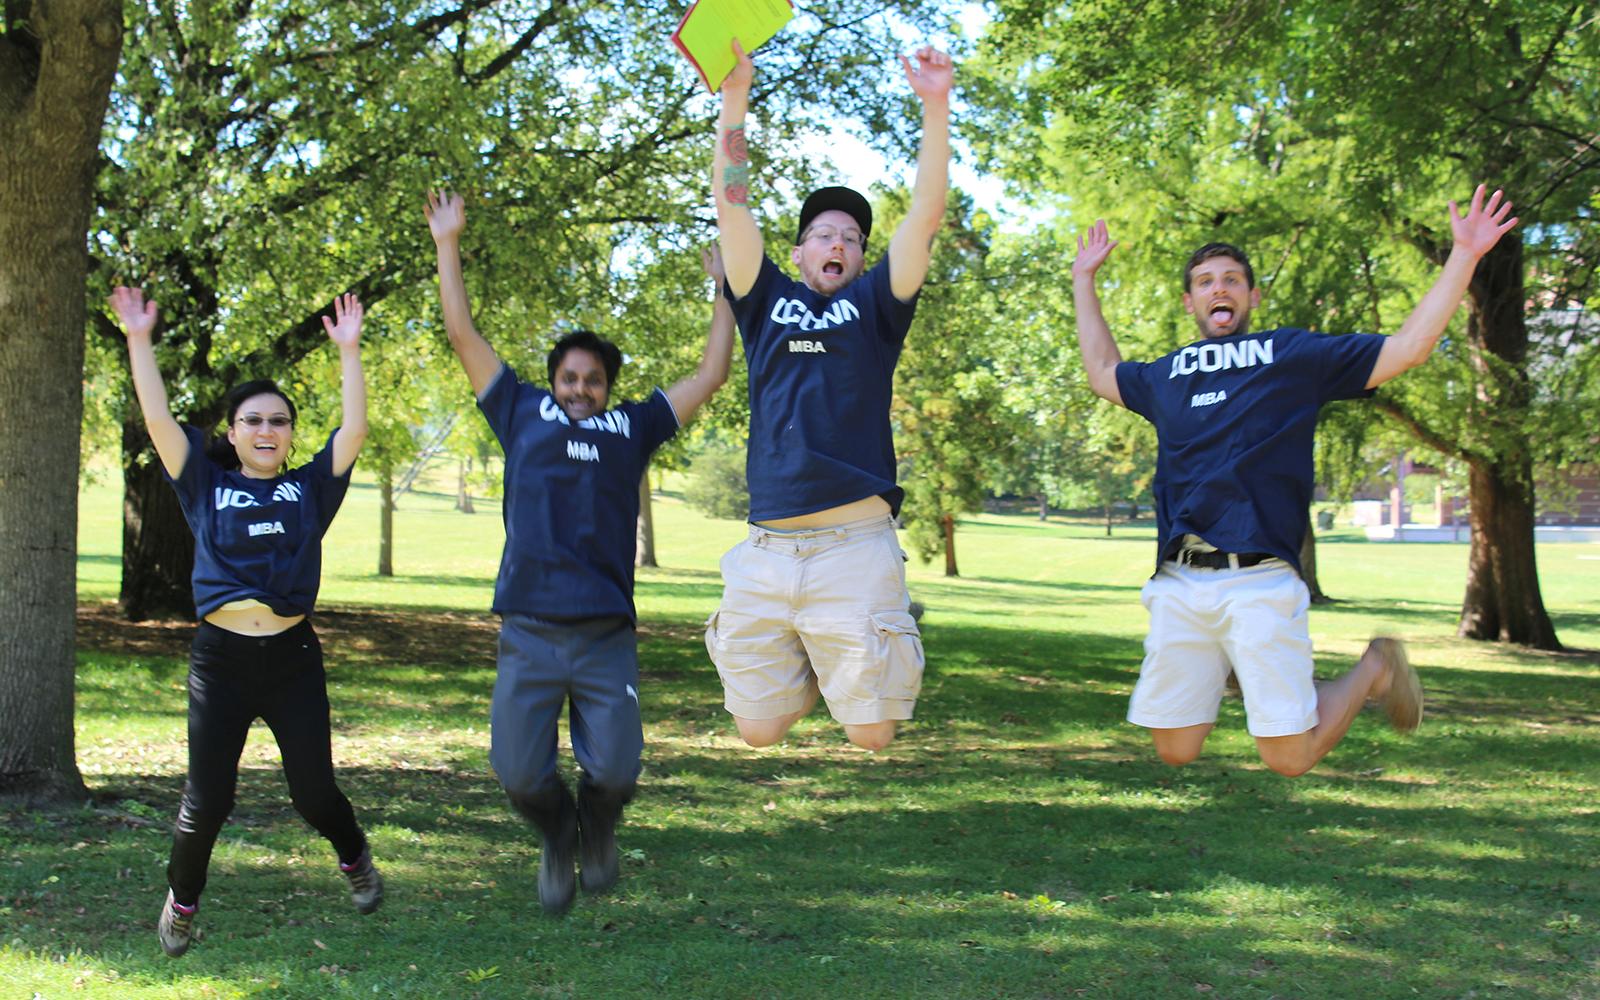 UConn MBA Student Life 2016